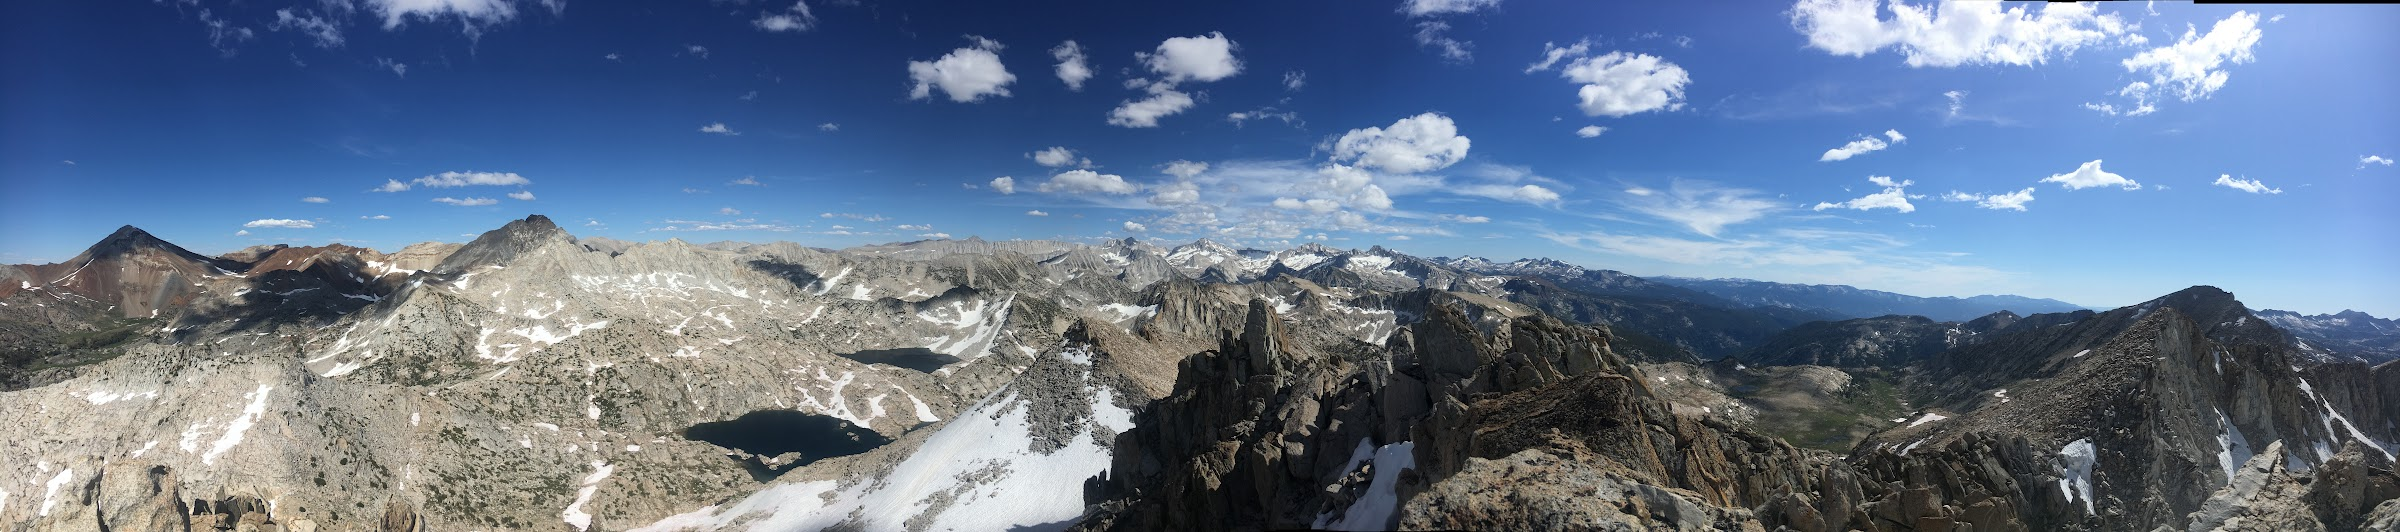 Summit view south from Mount Izaak Walton